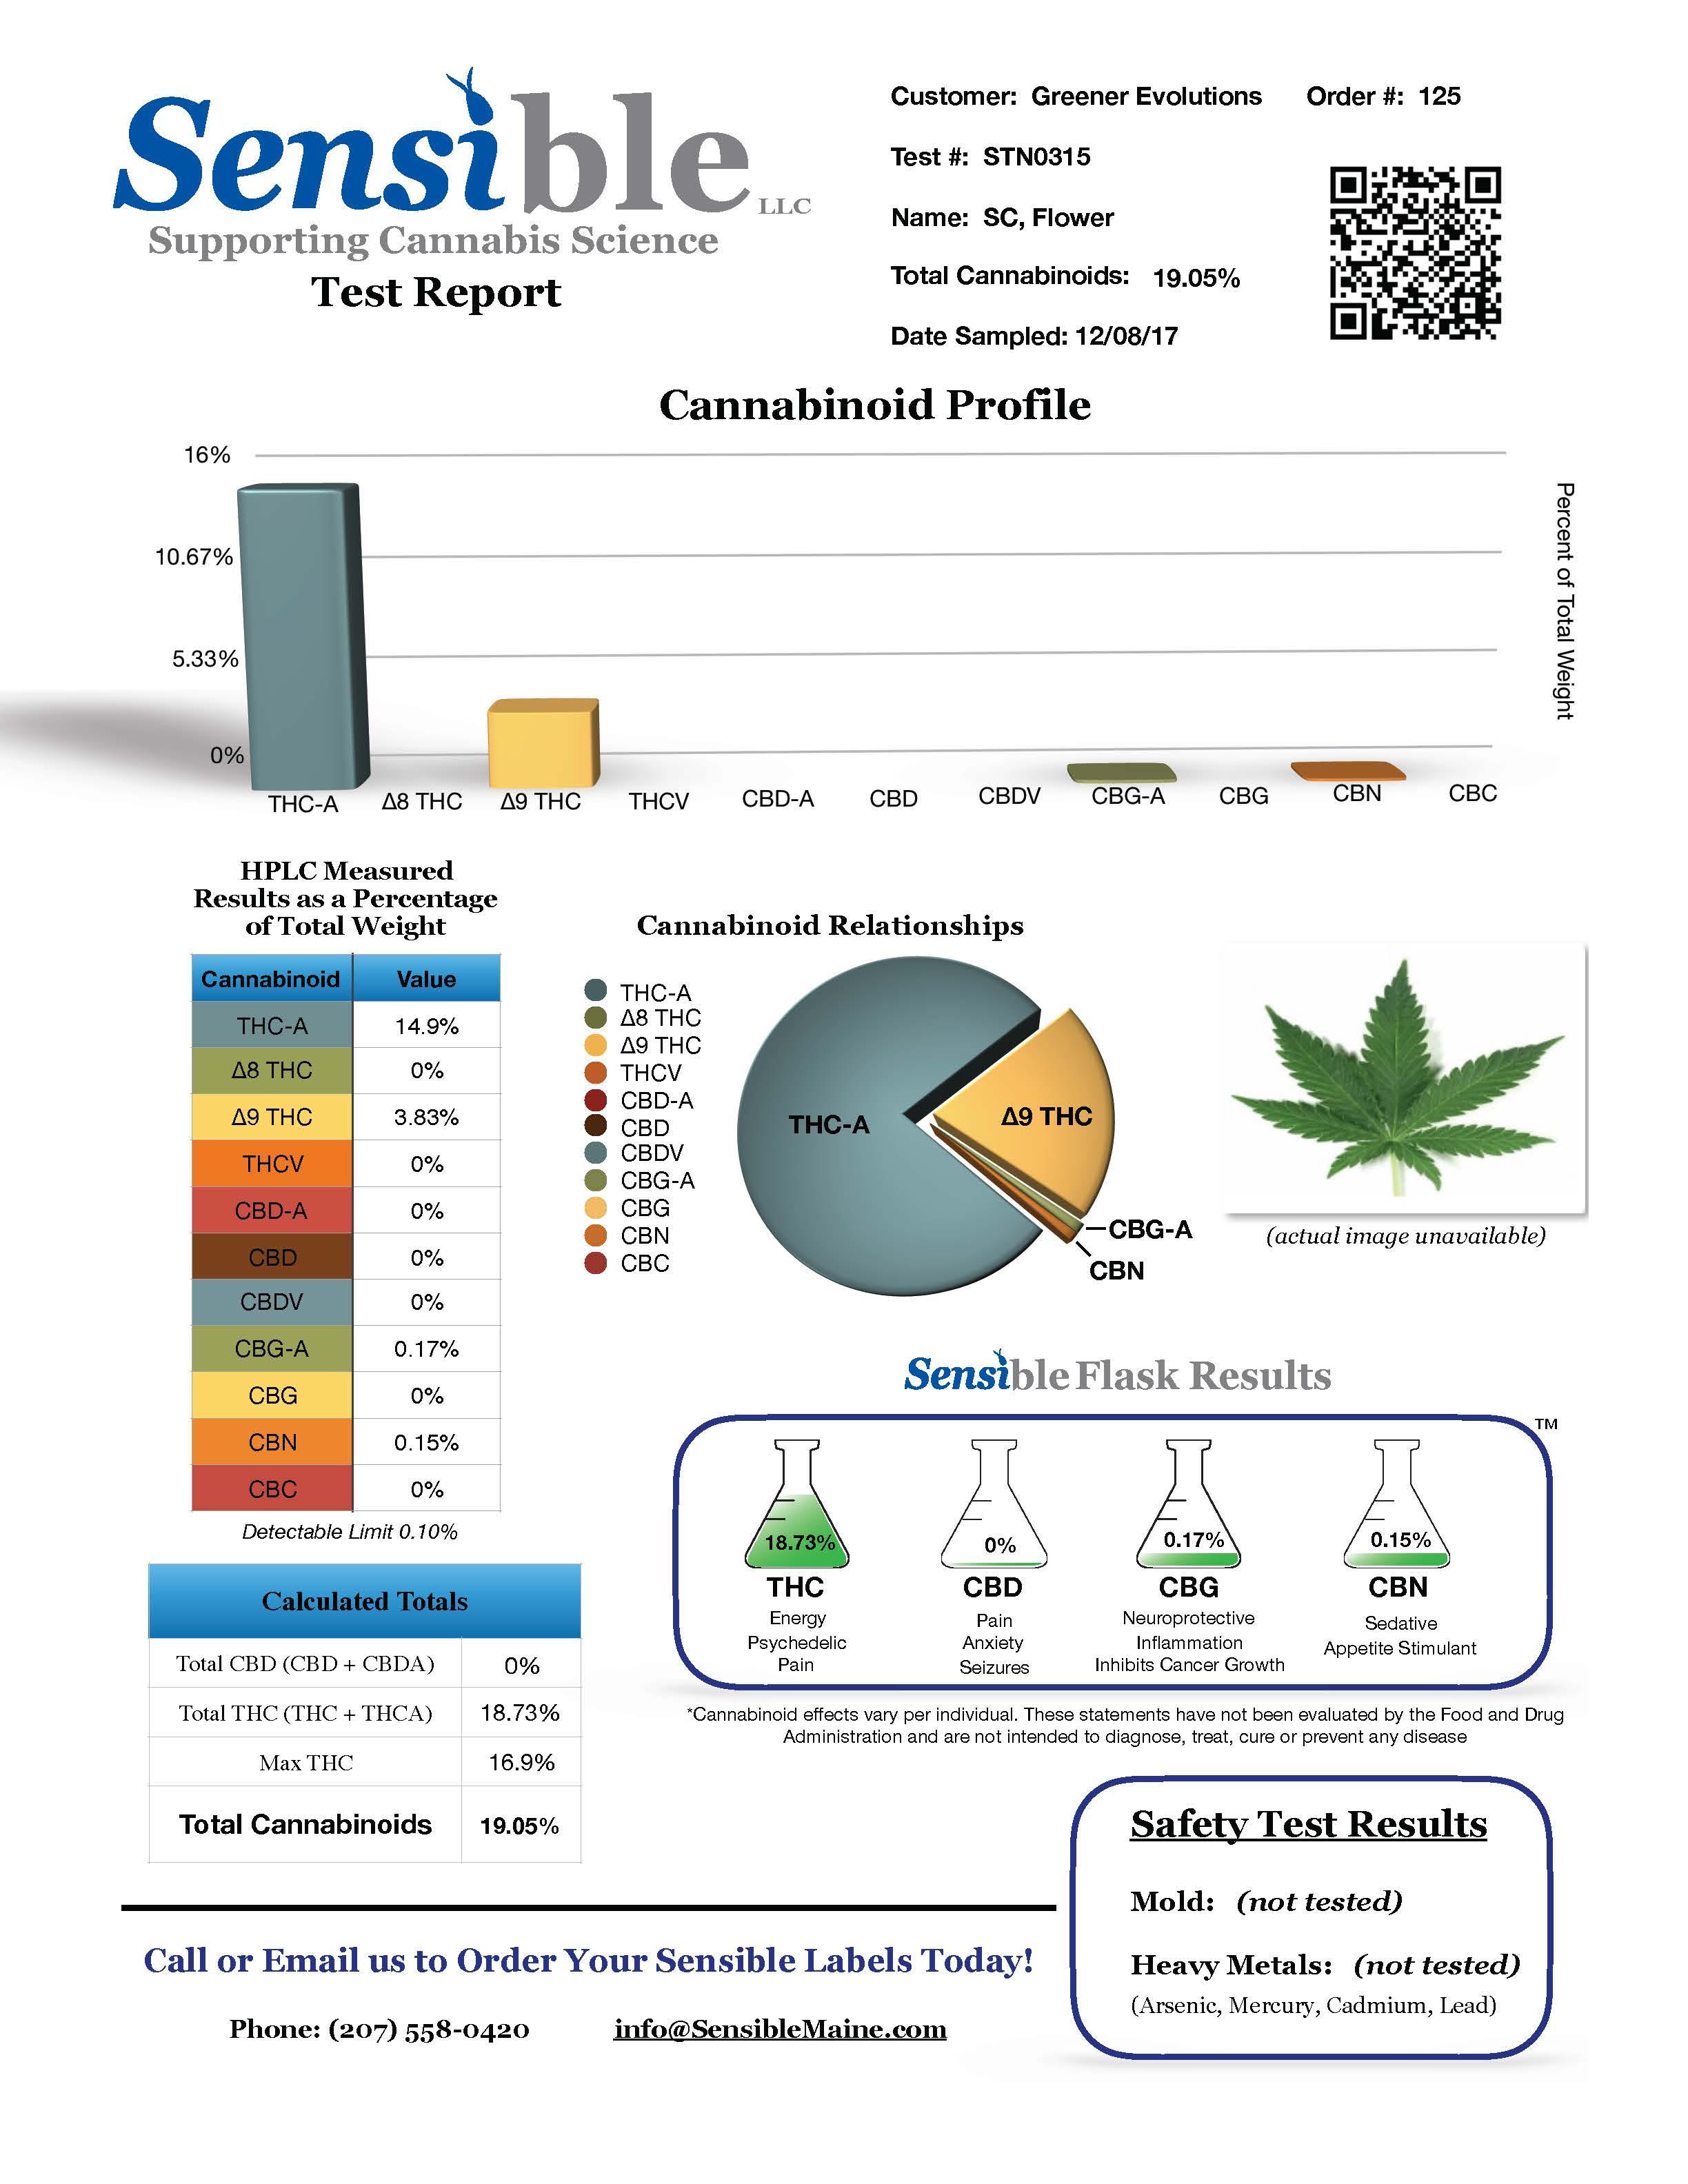 Test Report stn0315.jpg